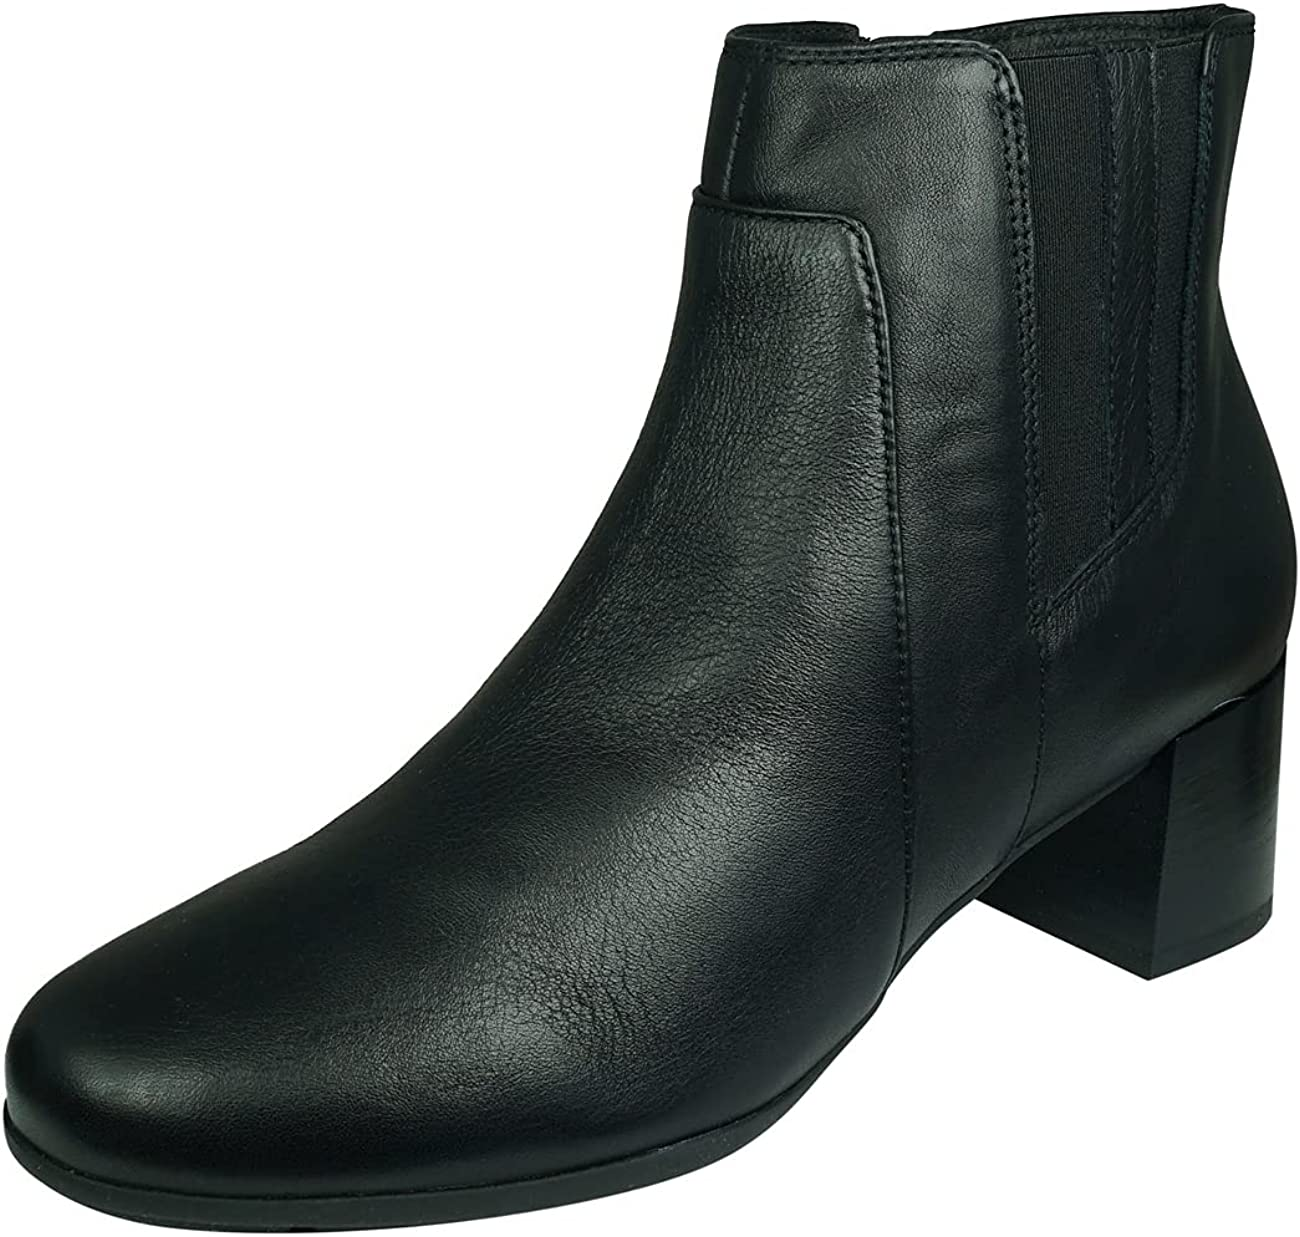 Geox Women's Sale Regular dealer item New Annya Leather Boot 38 8.0 Black US M EU